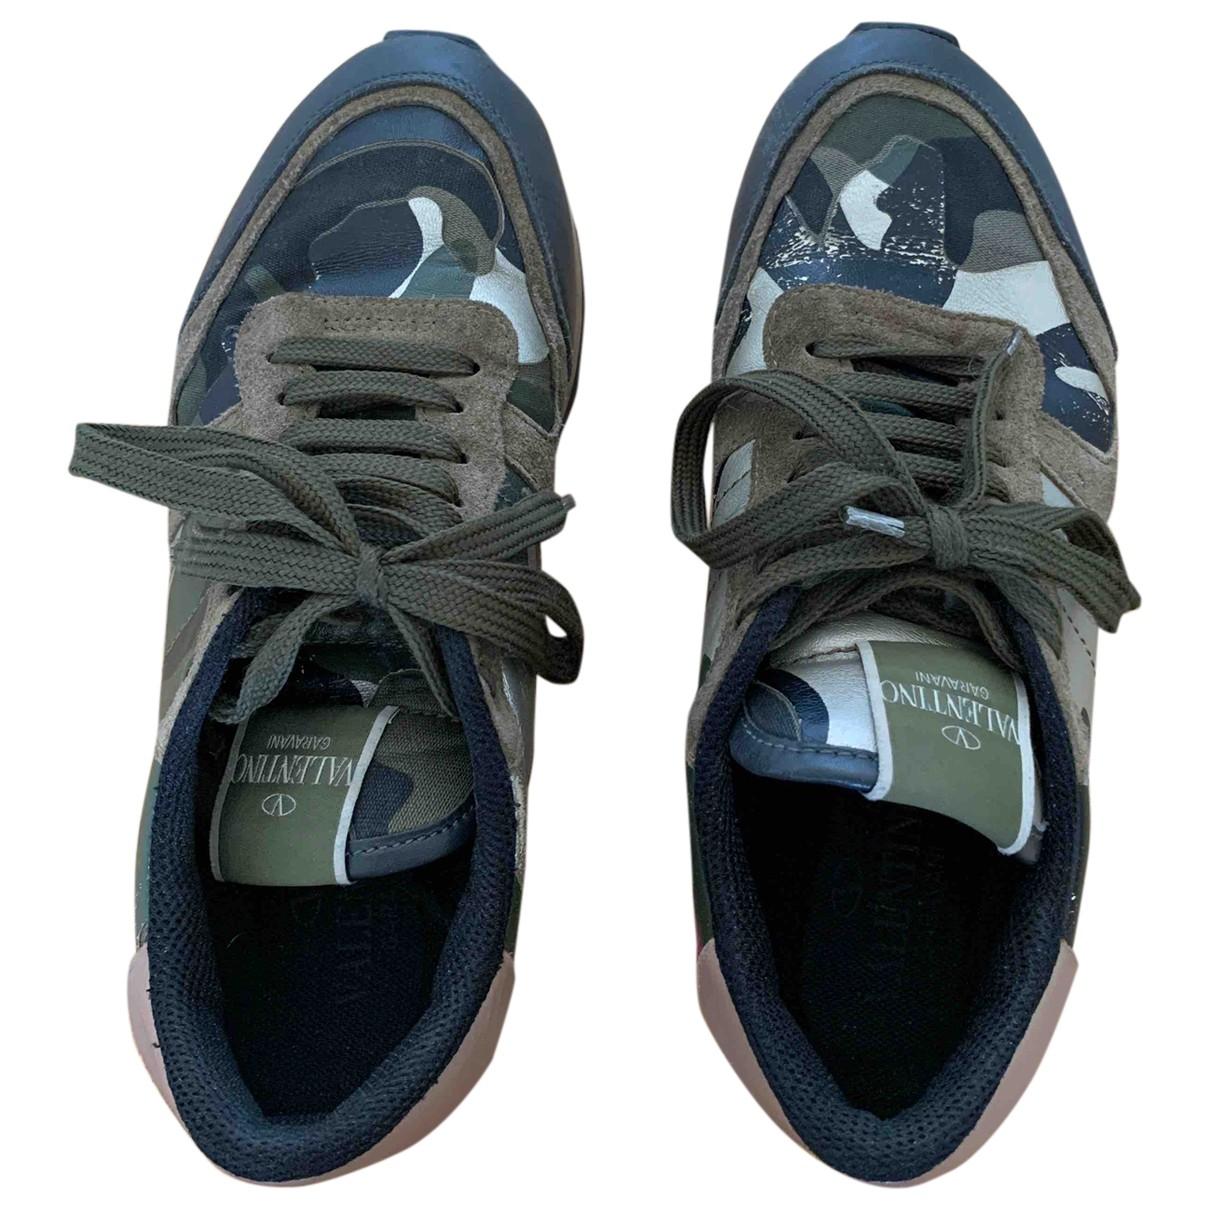 Valentino Garavani \N Sneakers in  Gruen Leder